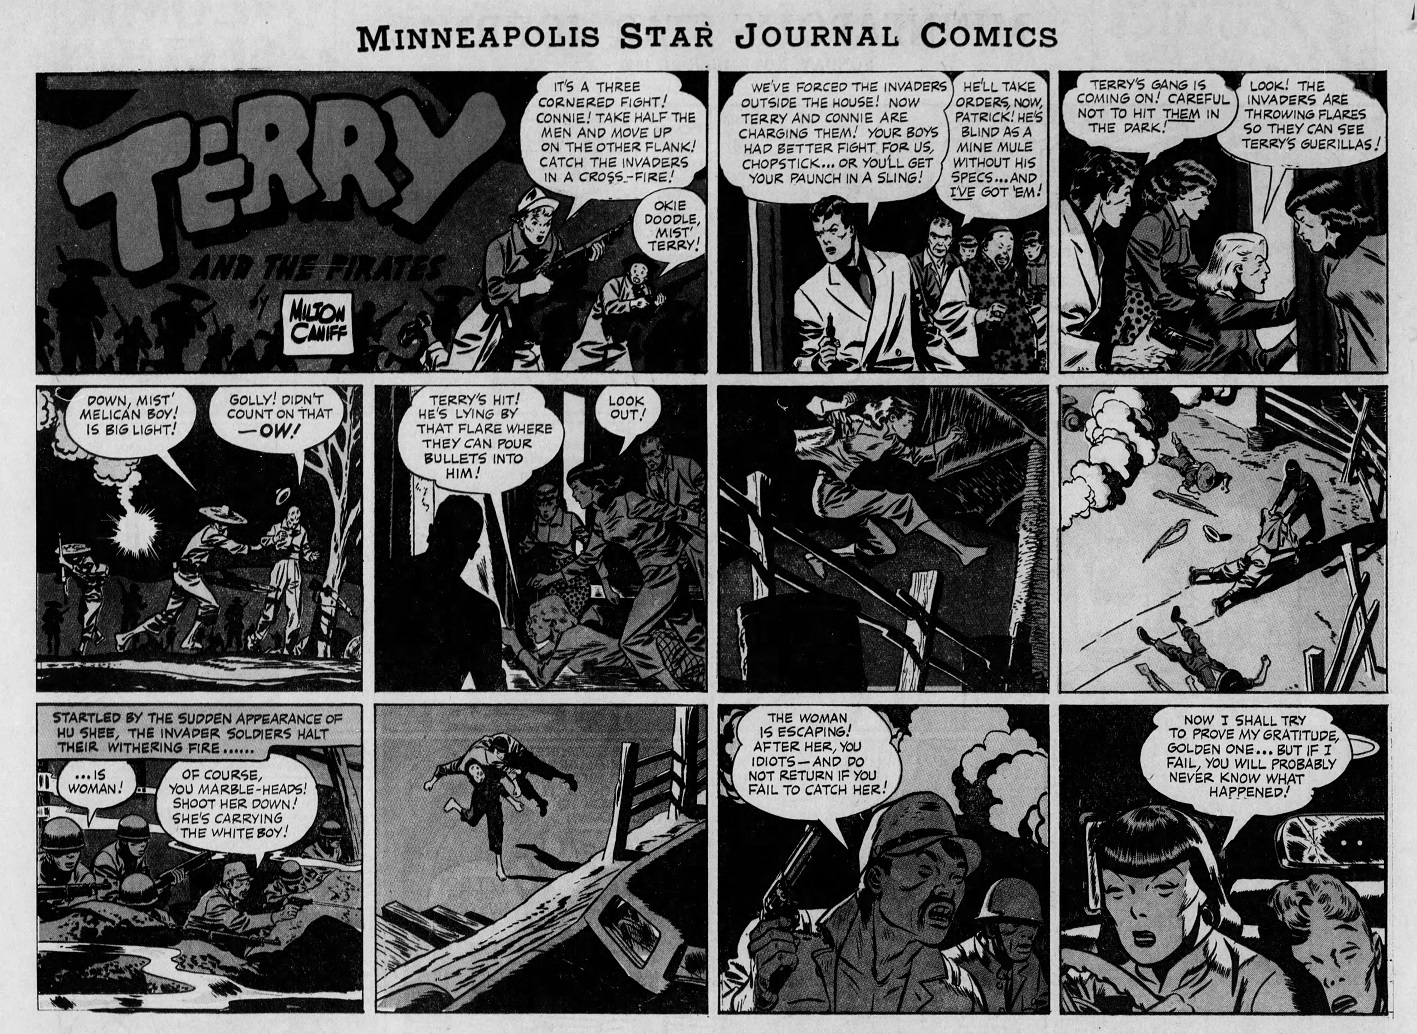 The_Minneapolis_Star_Sun__Nov_24__1940_.jpg